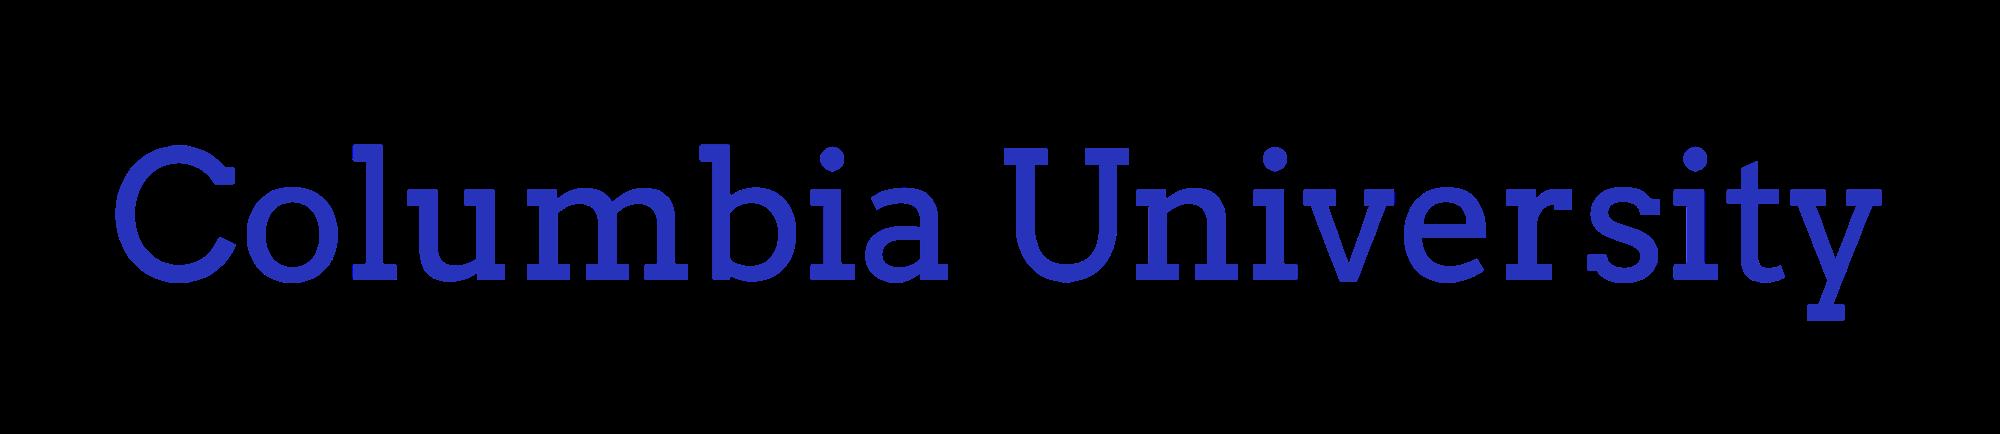 Columbia University-logo.png